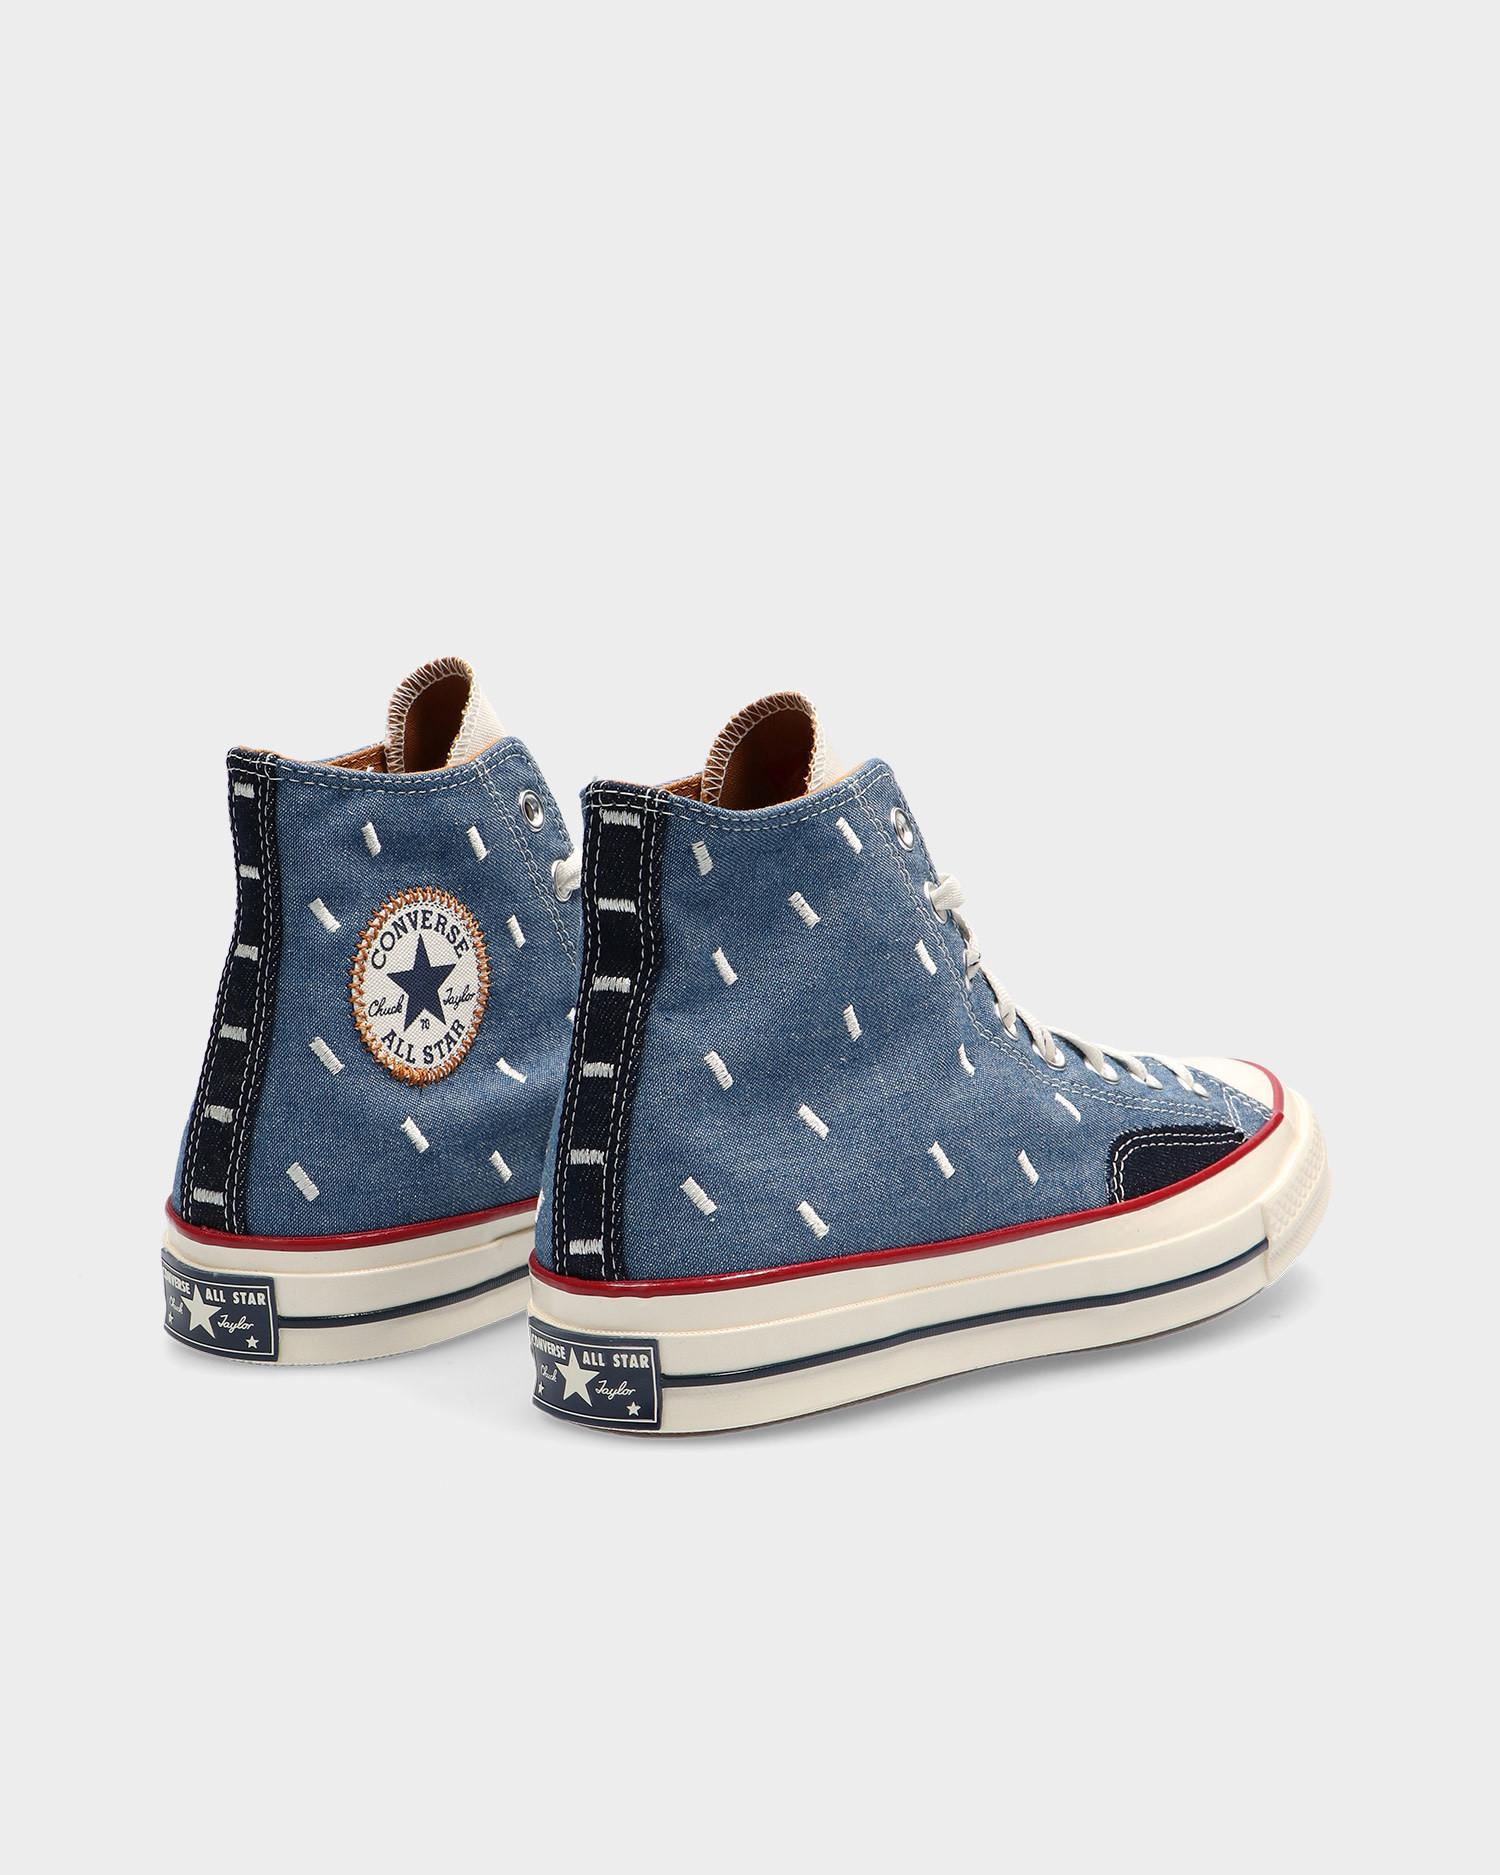 Converse Chuck 70 Hi Blue/Egret/Midnight Navy